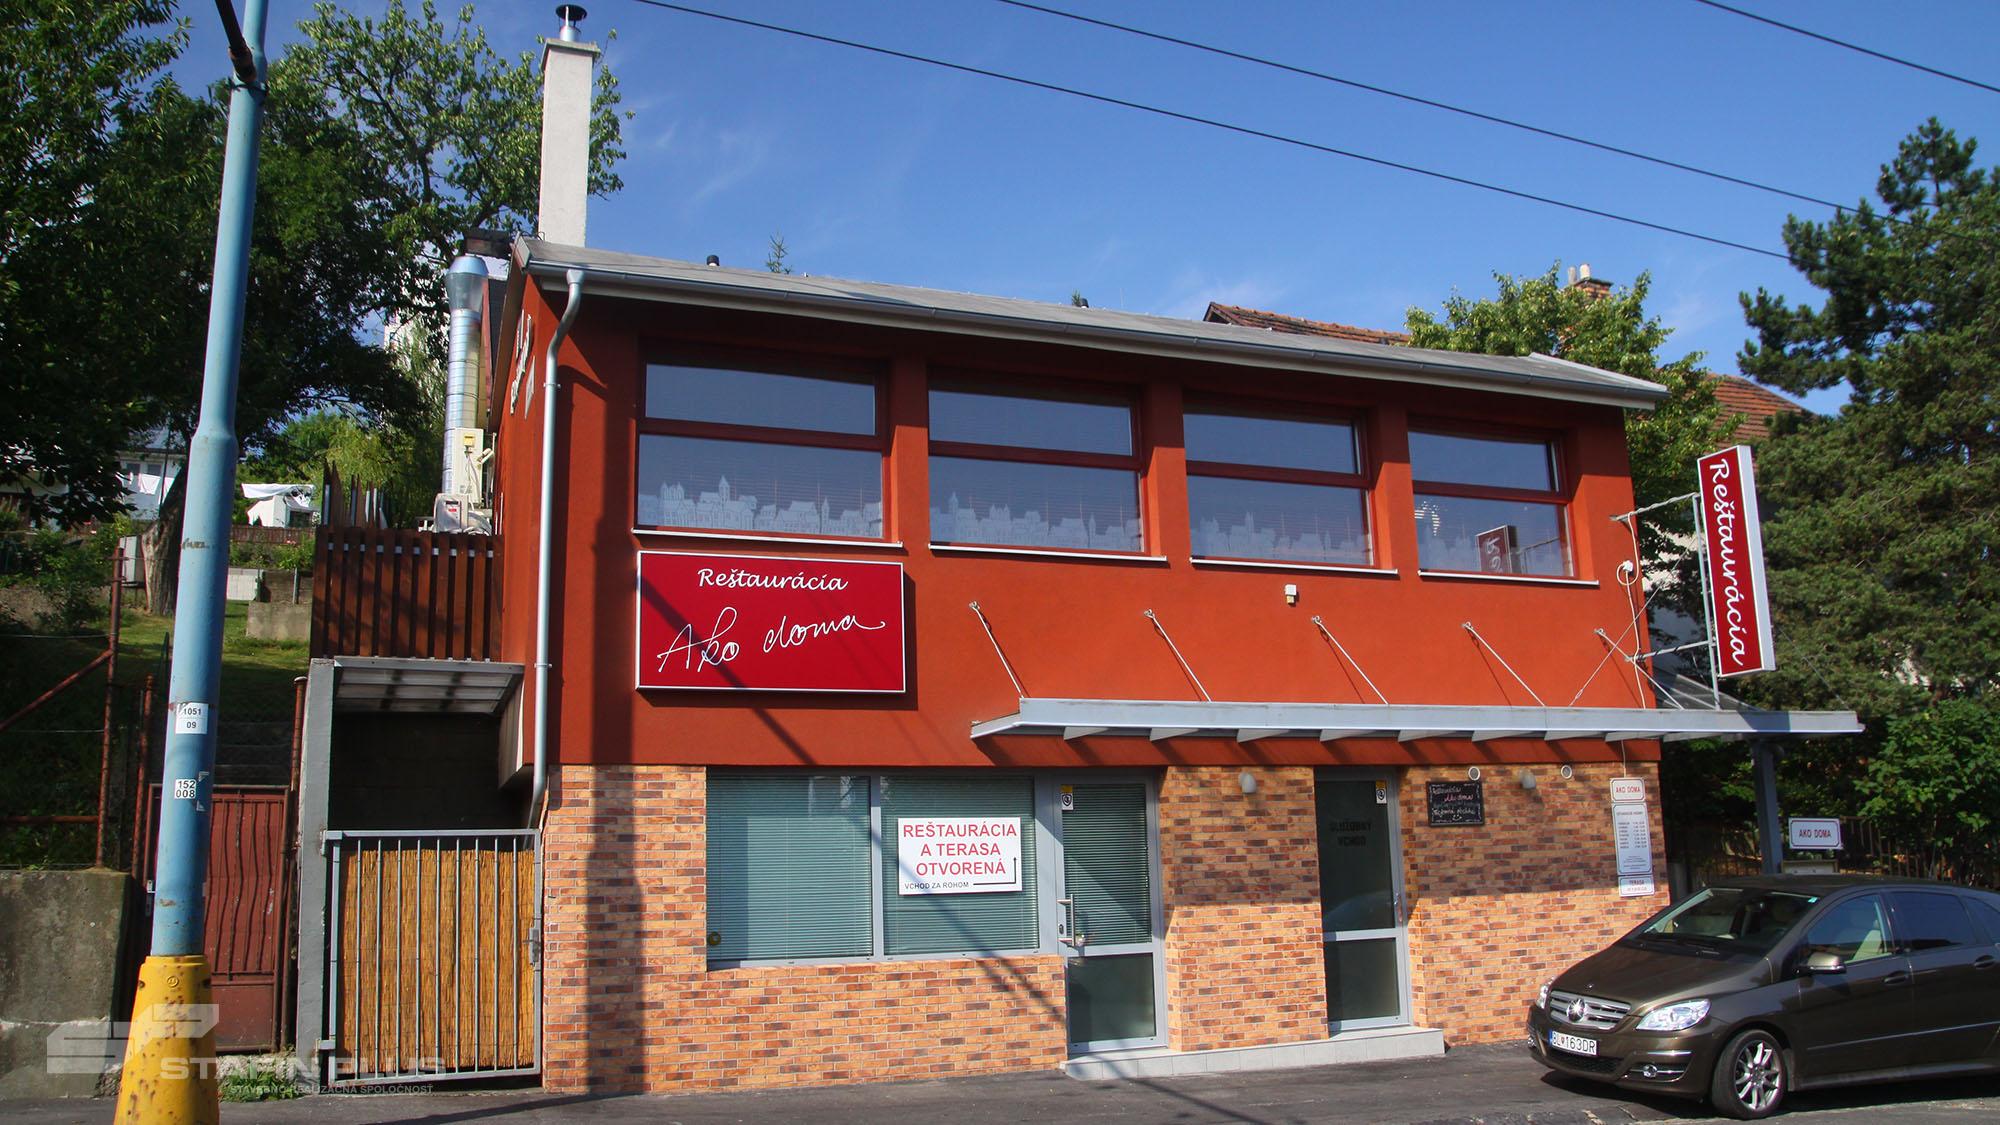 RestauraciaHorskypark21343997663